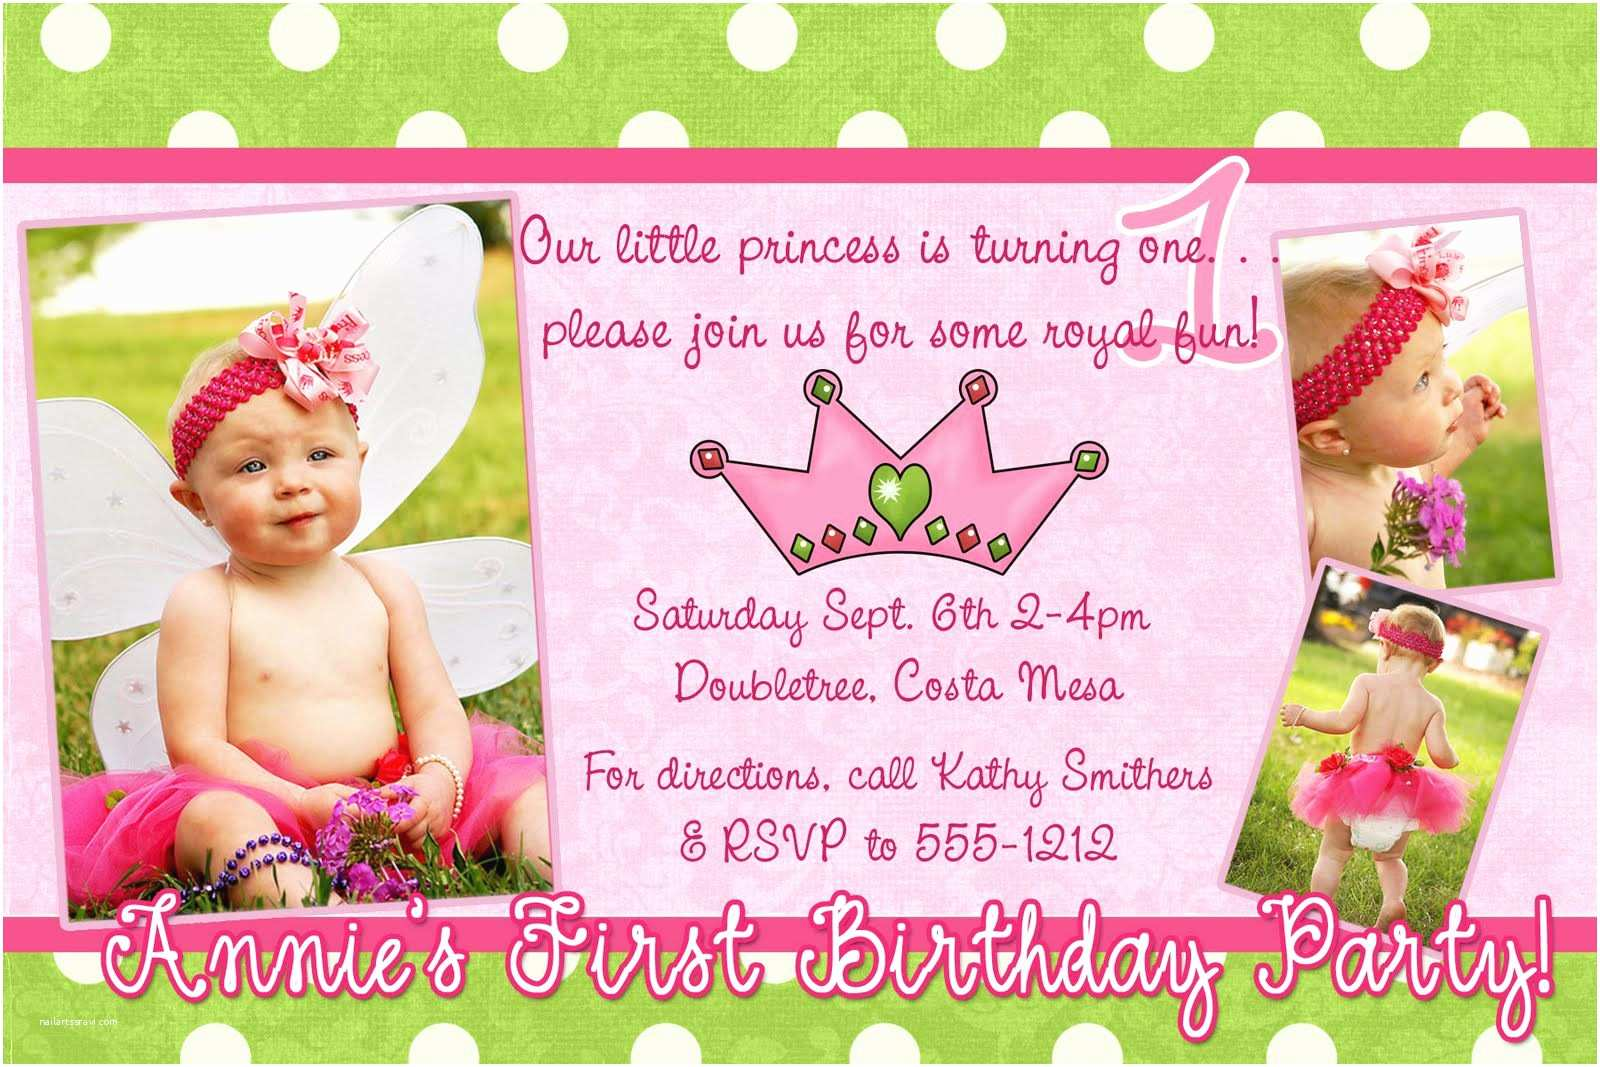 Birthday Invitations Wording 21 Kids Invitation That We Can Make